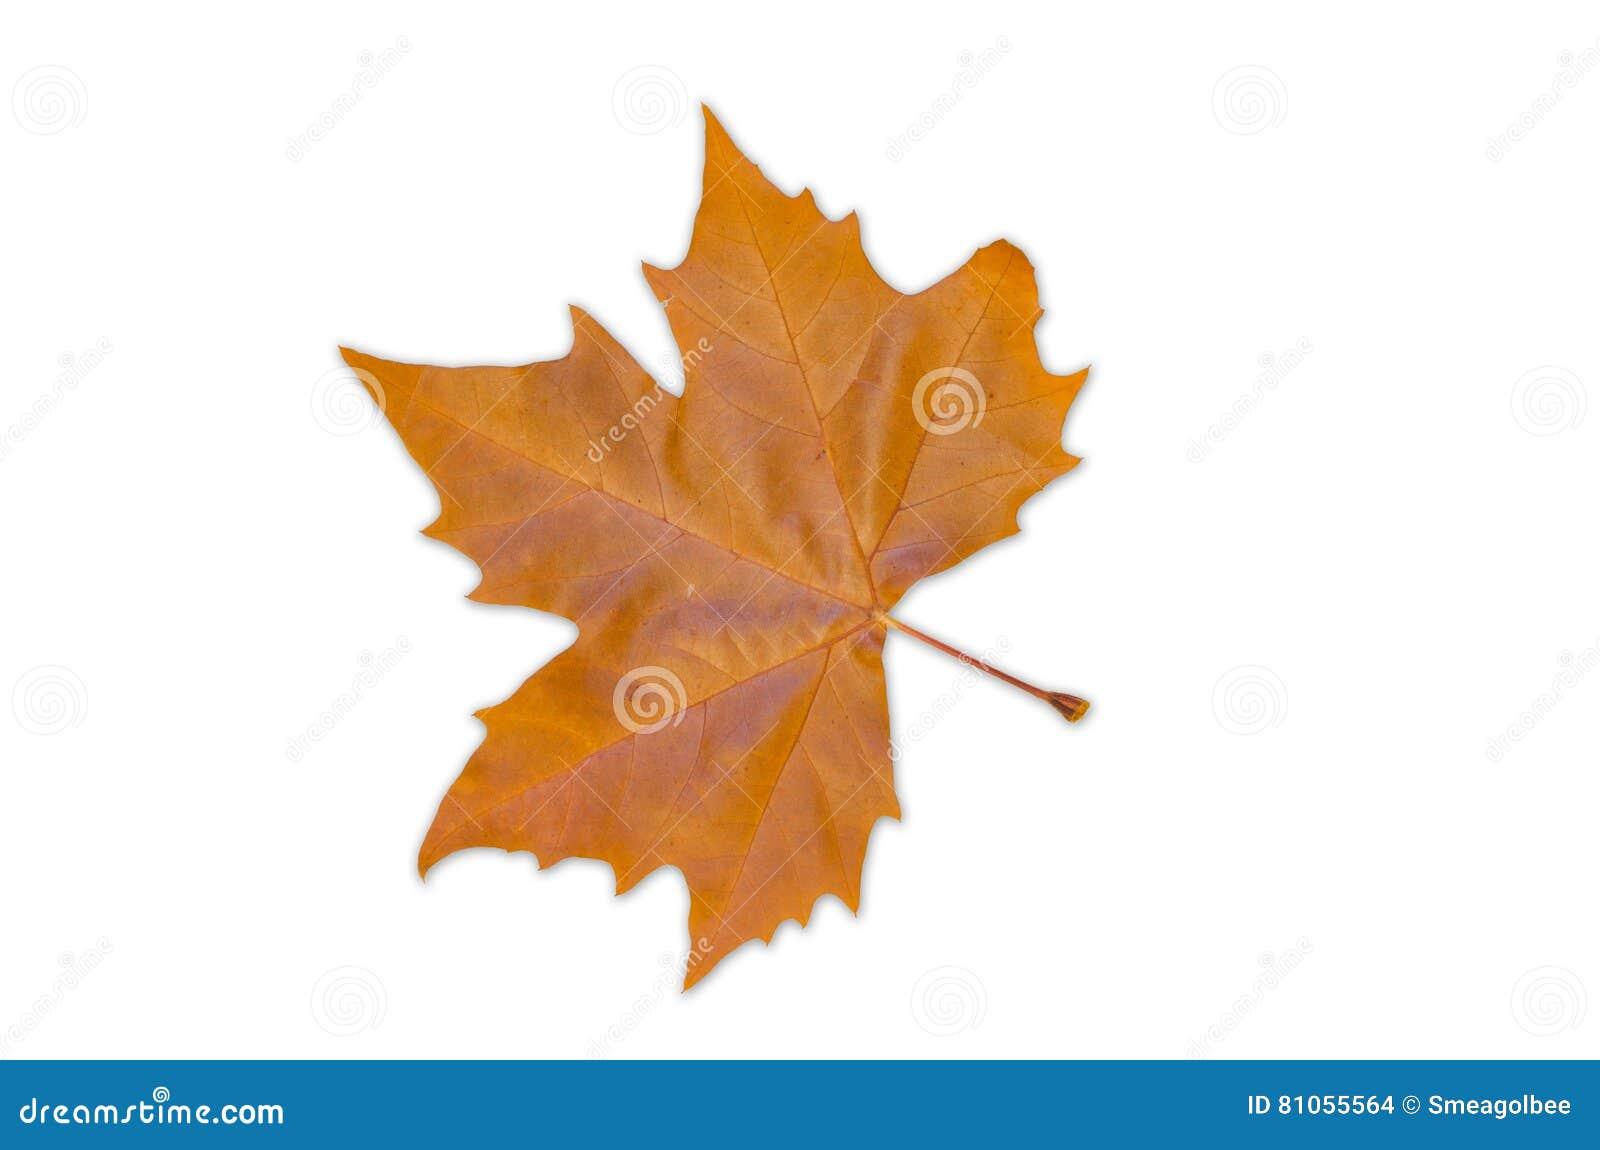 Norway Maple Leaf - Autumn Colour